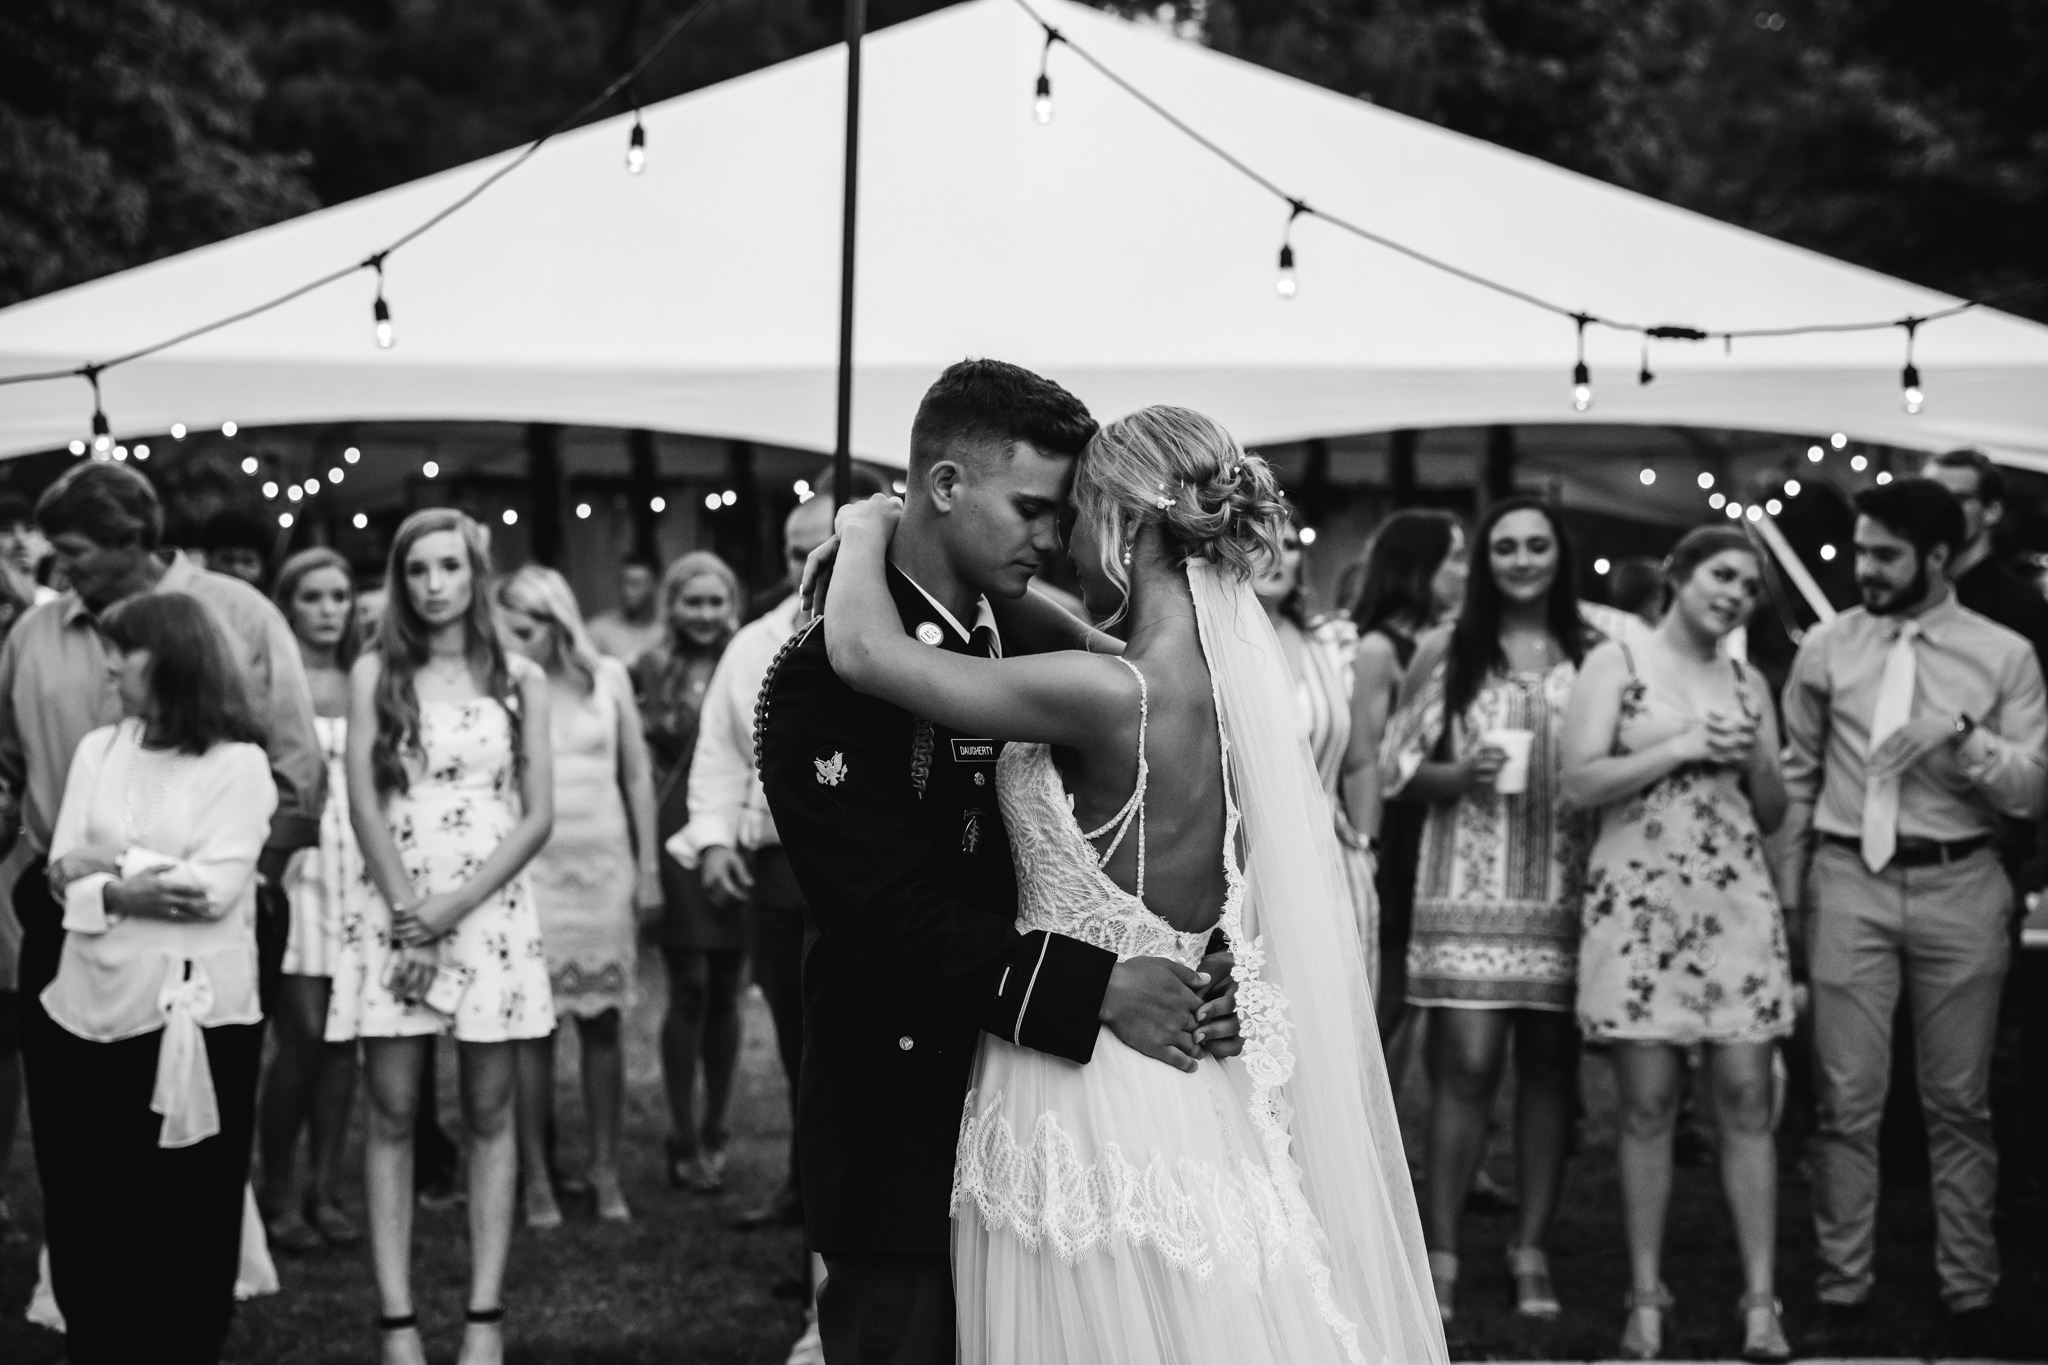 backyard-wedding-thewarmtharoundyou-lexy-branson-19.jpg